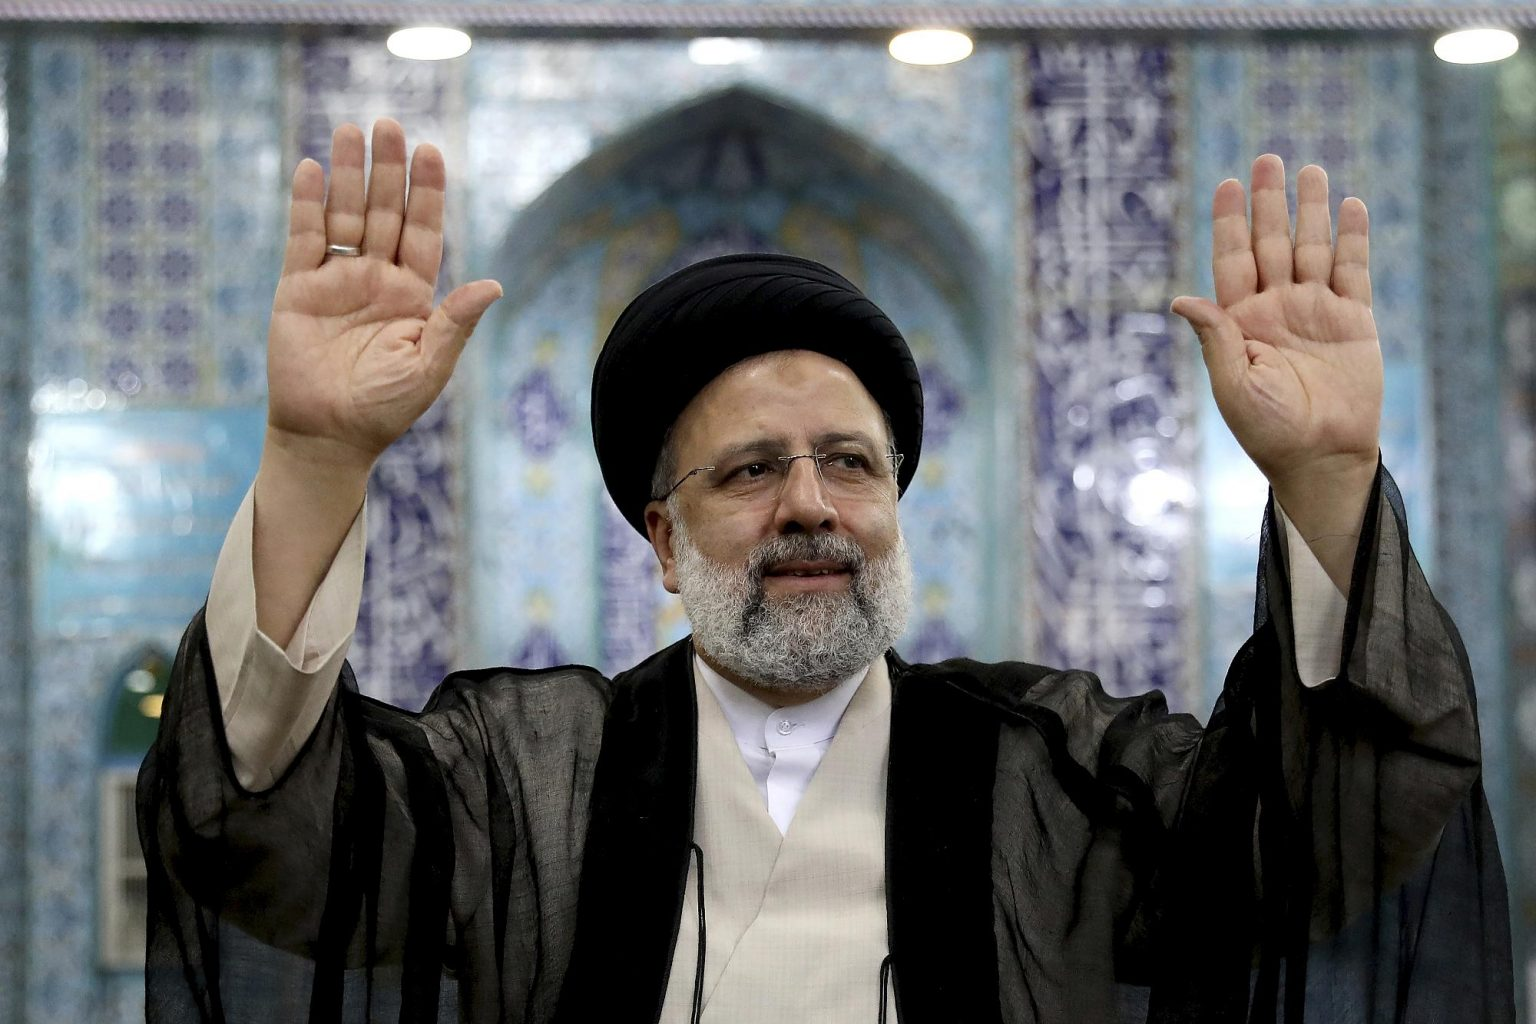 Ebrahim Raisi wins Iran's 2021 Presidential Election  ഇറാന്റെ 2021 ലെ പ്രസിഡന്റ് തിരഞ്ഞെടുപ്പിൽ ഇബ്രാഹിം റെയ്സി വിജയിച്ചു_40.1